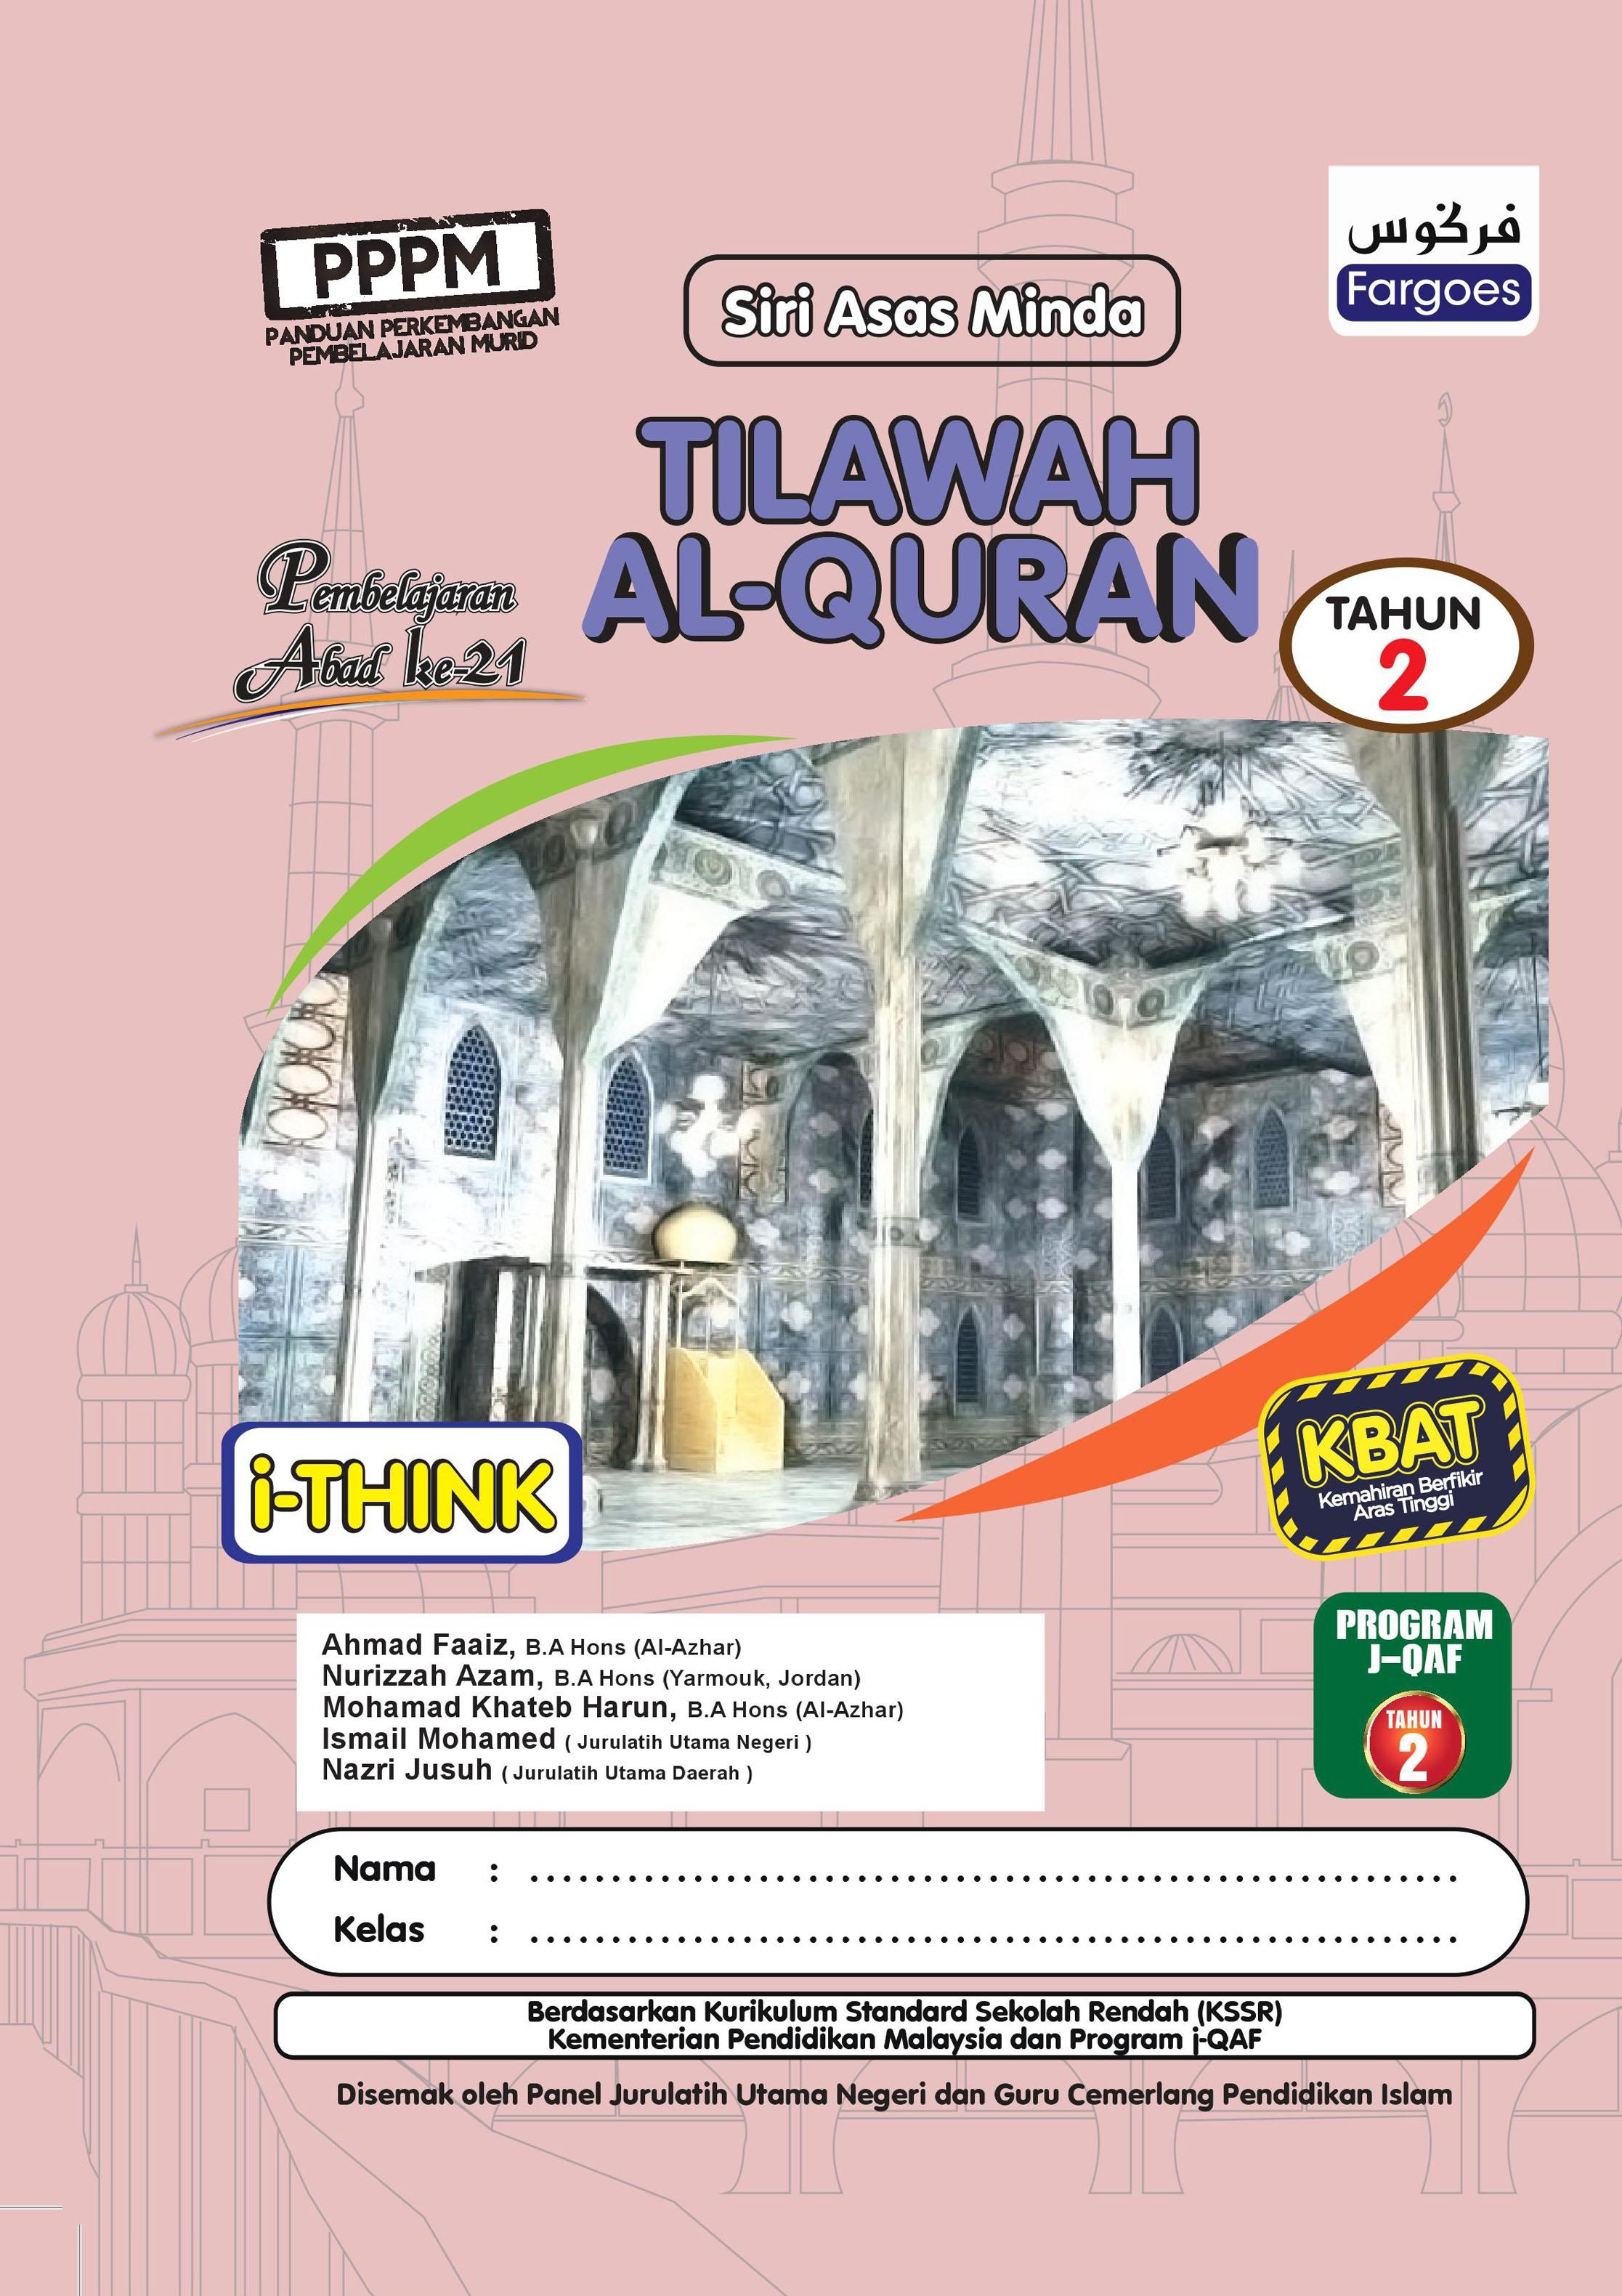 Download Dskp Pendidikan islam Tahun 2 Menarik Tilawah Al Quran Tahun 2 Fargoes Books Sdn Bhd Of Muat Turun Dskp Pendidikan islam Tahun 2 Yang Berguna Khas Untuk Para Guru Lihat